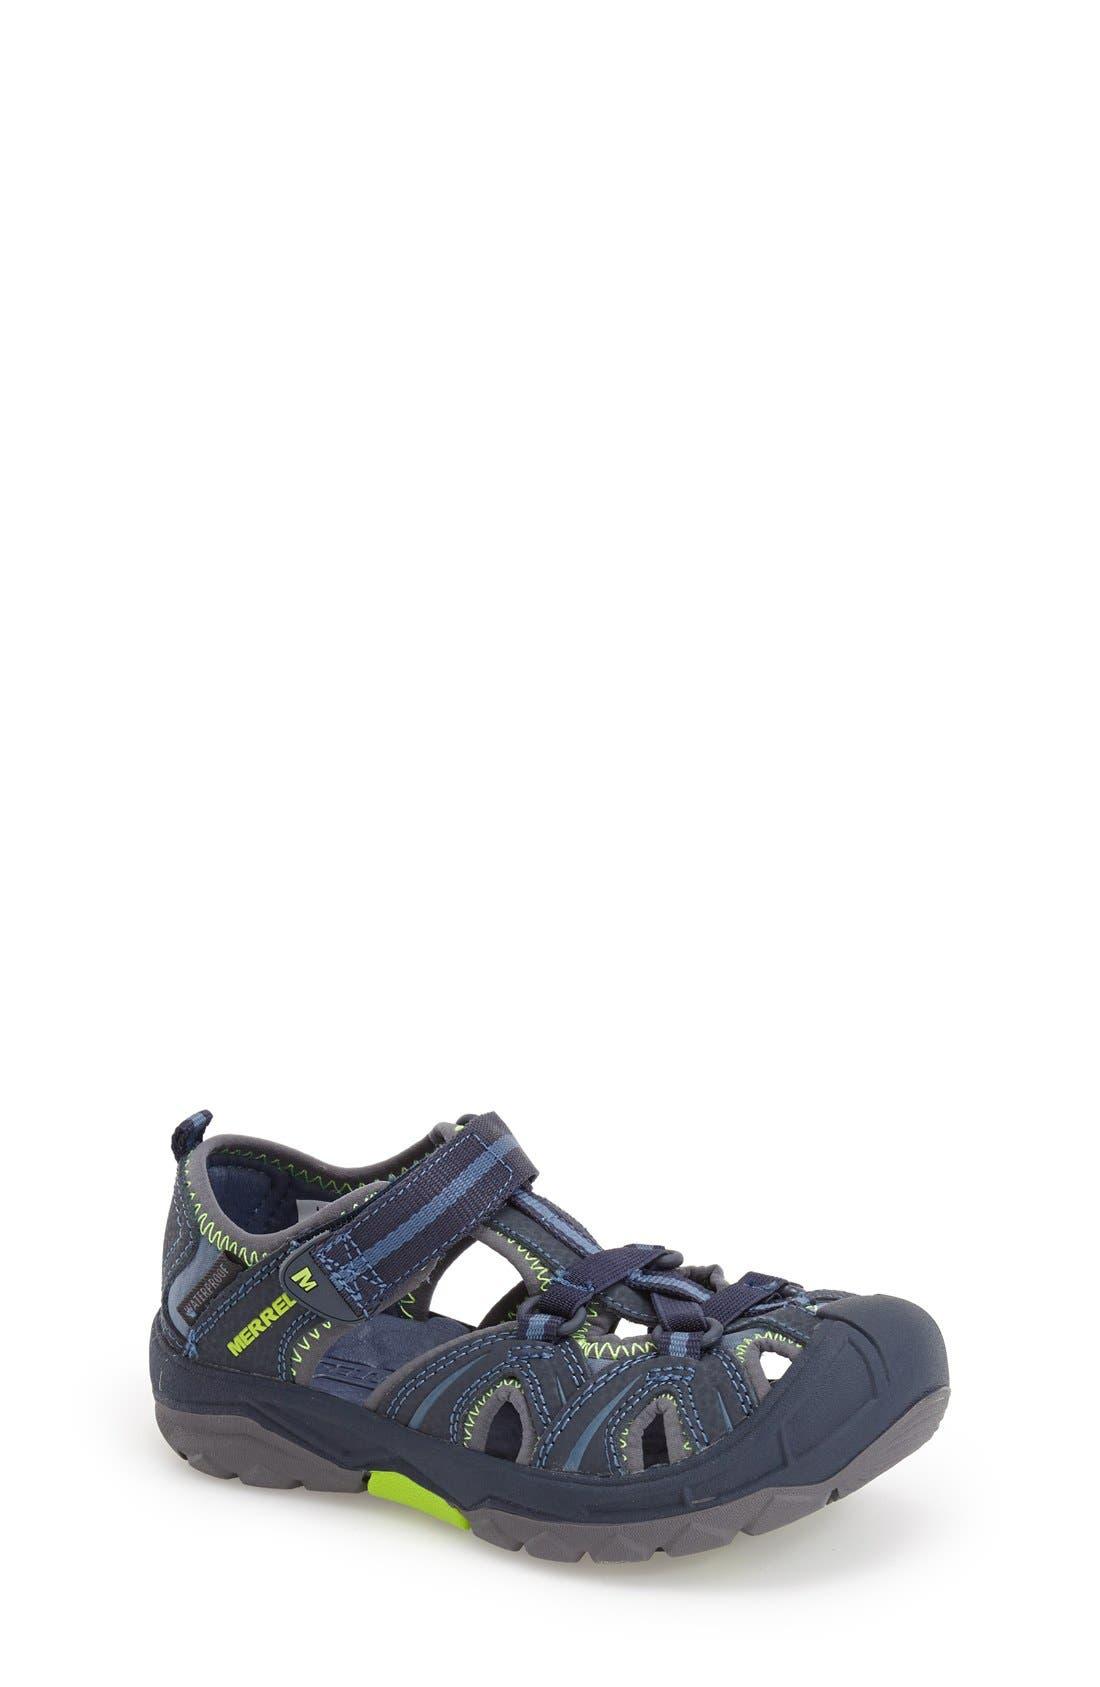 'Hydro' Water Sandal,                             Main thumbnail 1, color,                             NAVY/ GREEN